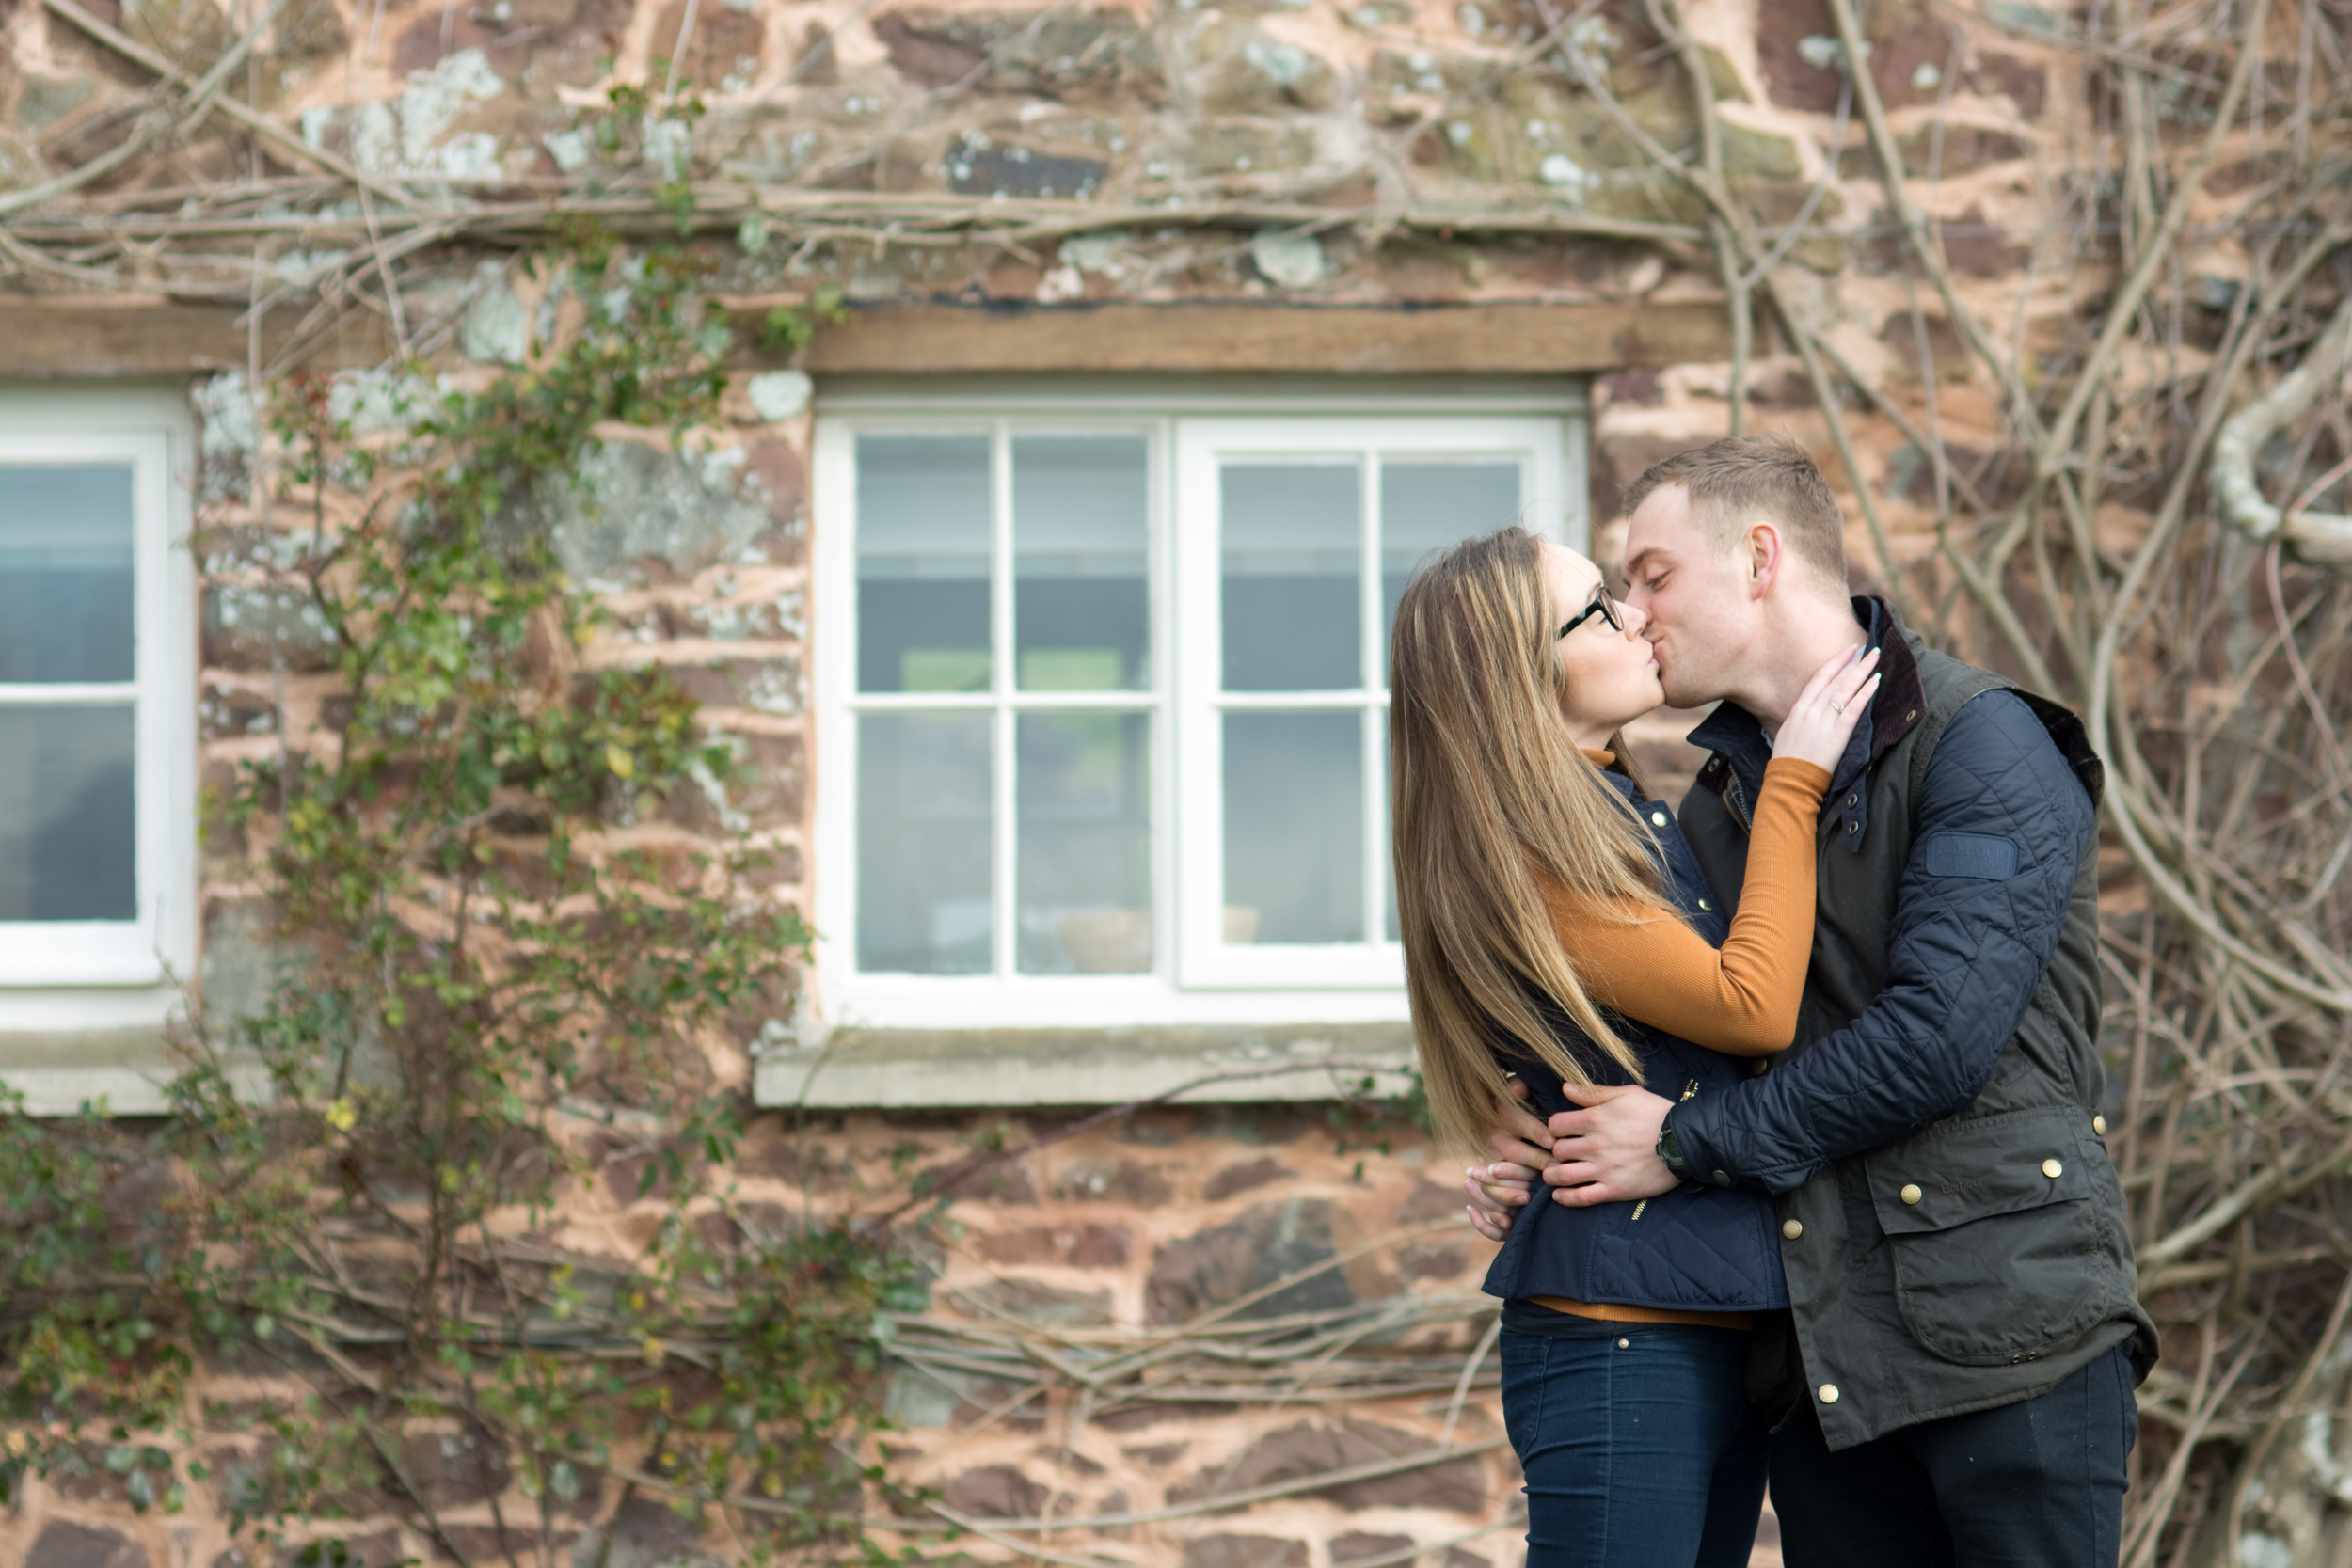 cindy and robs pre wedding shoot at fursdon house, kiss